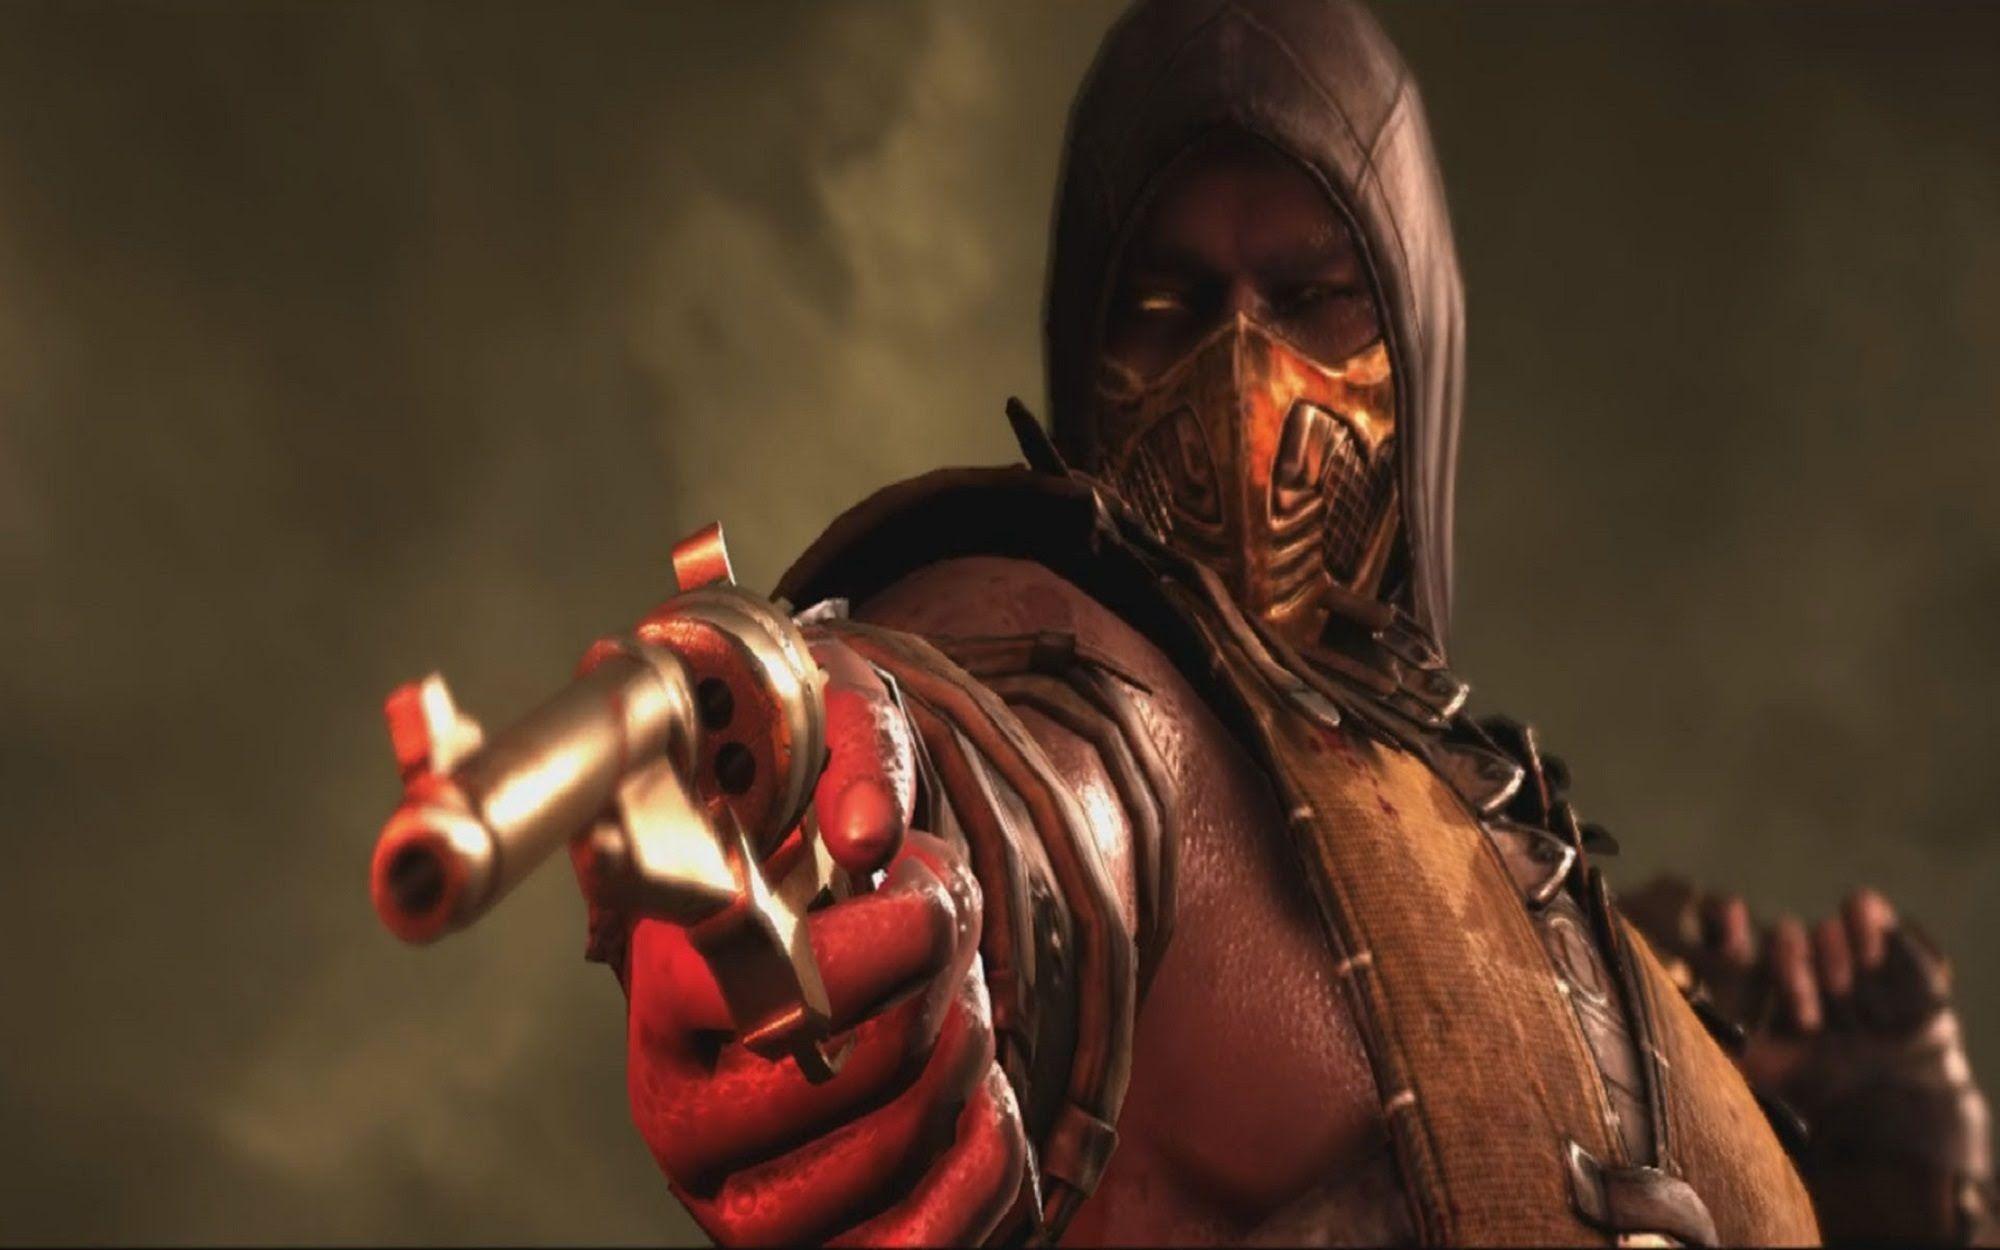 Mortal Kombat X: Scorpion And Erron Black Swap Fatalities